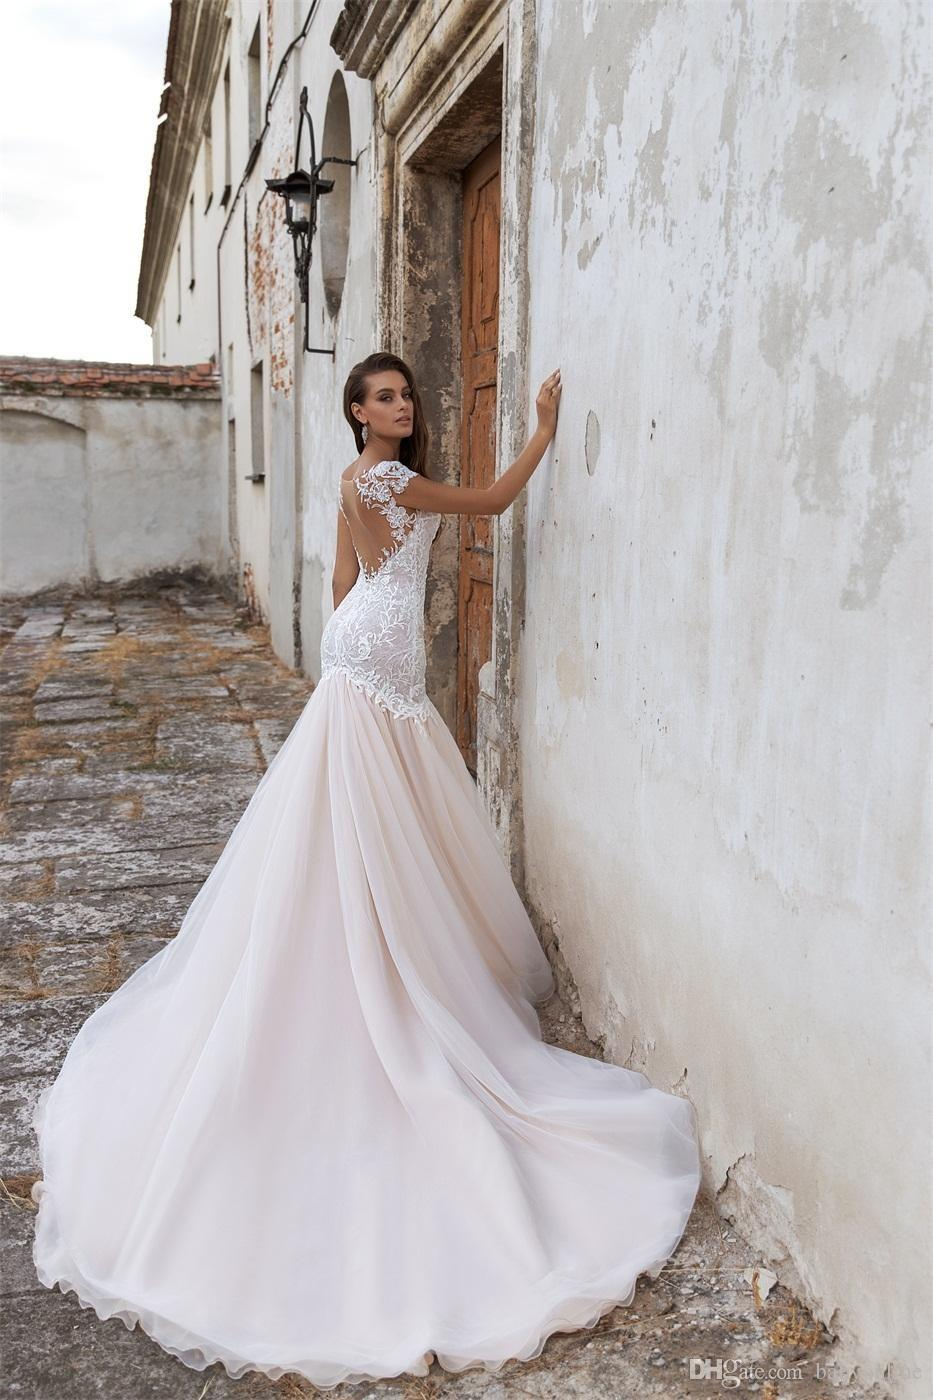 2020 Sexy Mermaid Wedding Dresses Short Sleeves Backless Wedding Dress Appliqued Sequins Court Train Custom Made Bridal Gowns Short Bridal Dresses